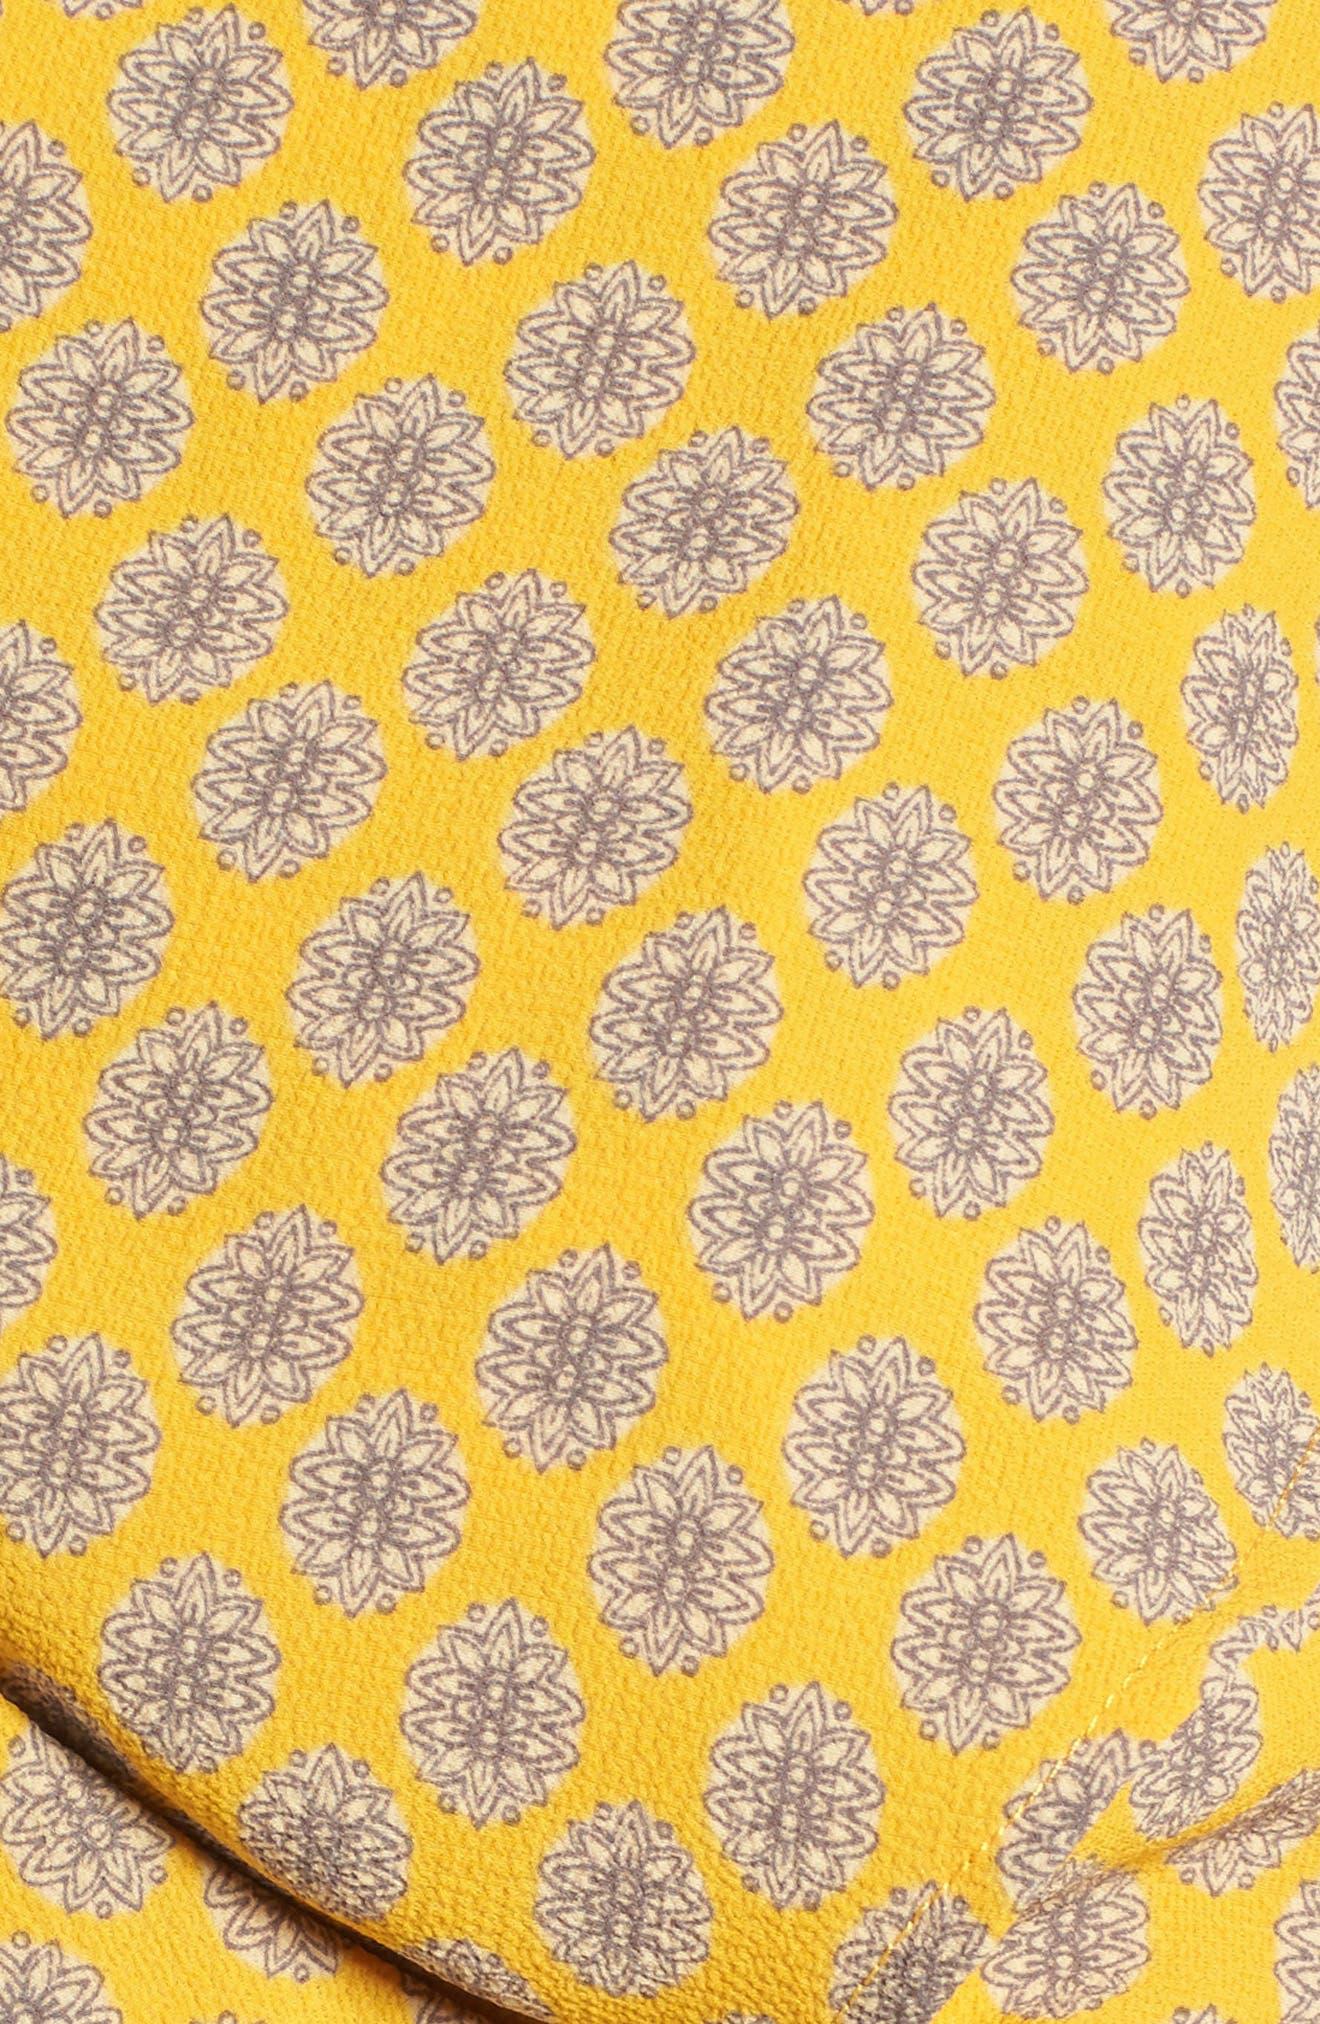 Cape Sleeve Wrap Crop Top,                             Alternate thumbnail 5, color,                             Gold/Grey